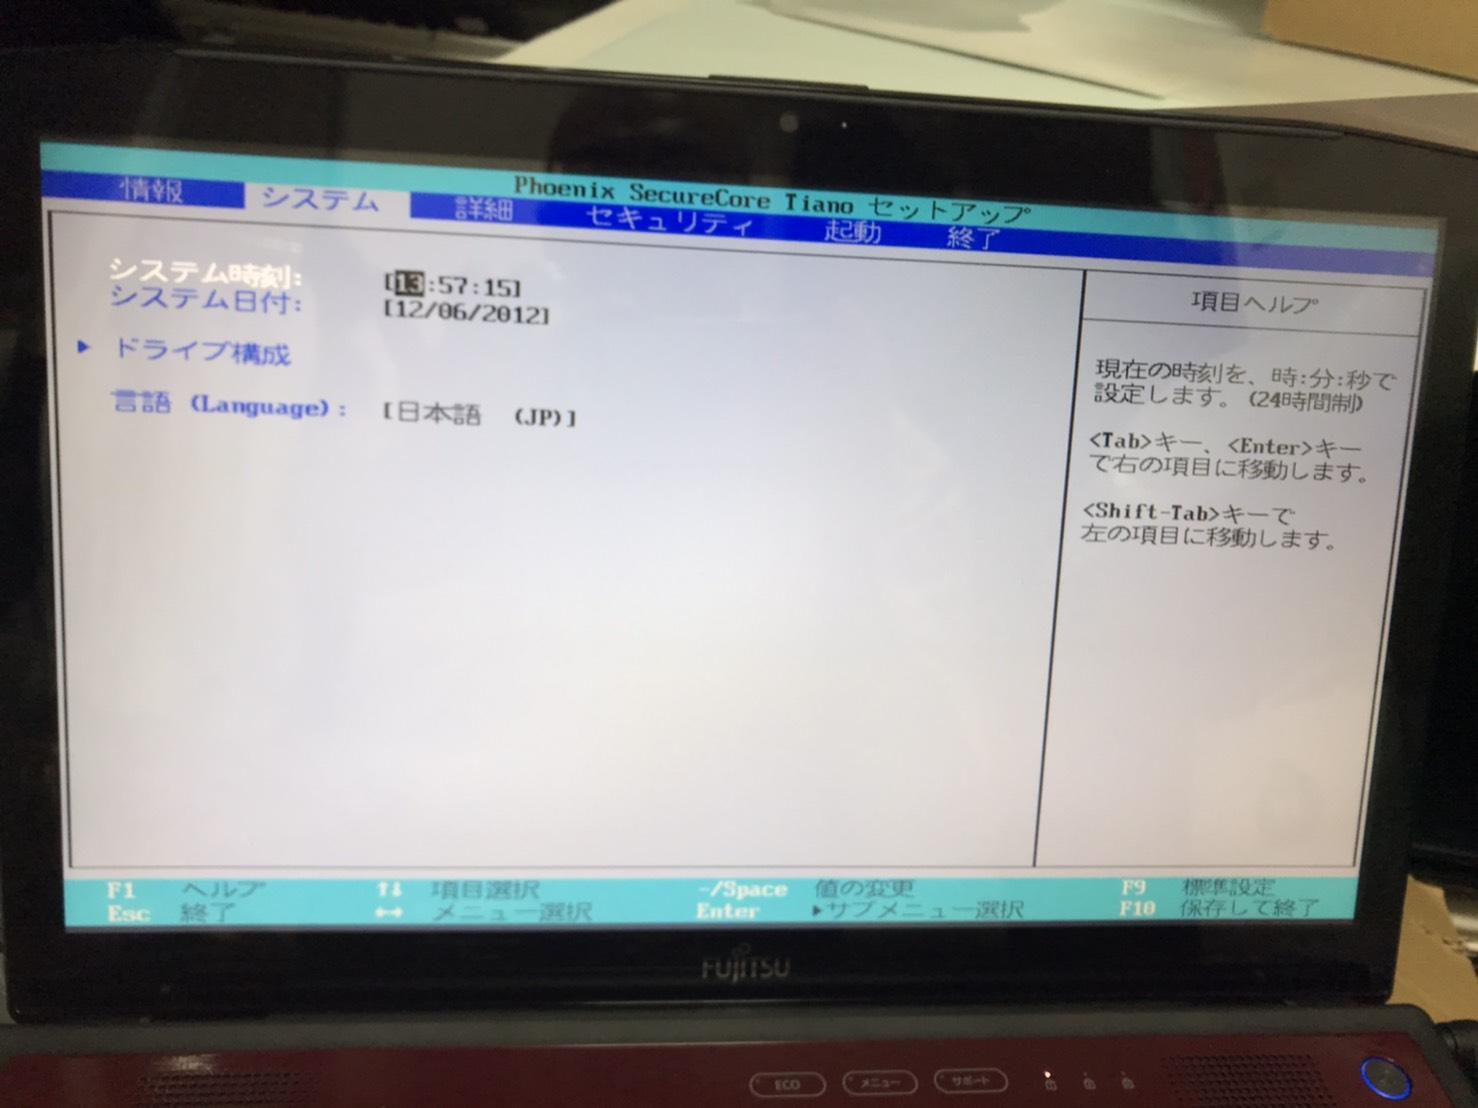 S__23773189.jpg